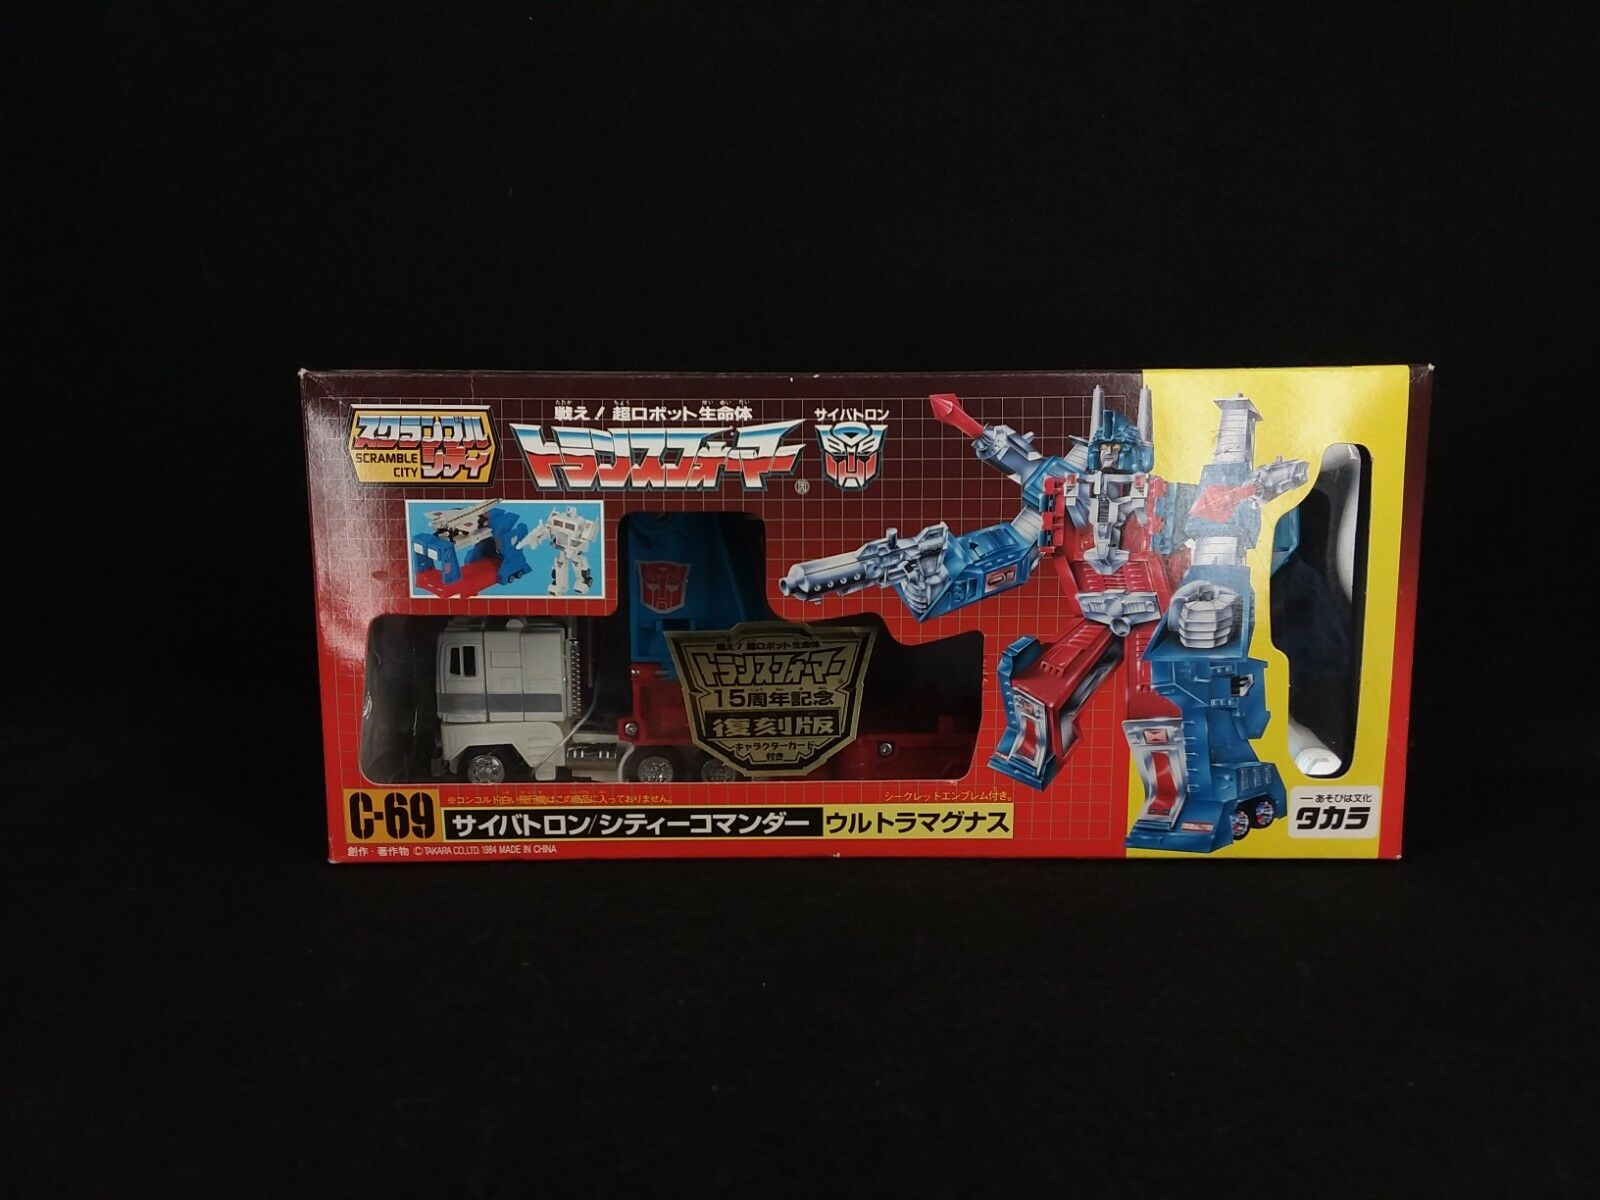 Transformers G1 15th Anniversary Re-issue Ultra Magnus Scramble City C-69 Takara